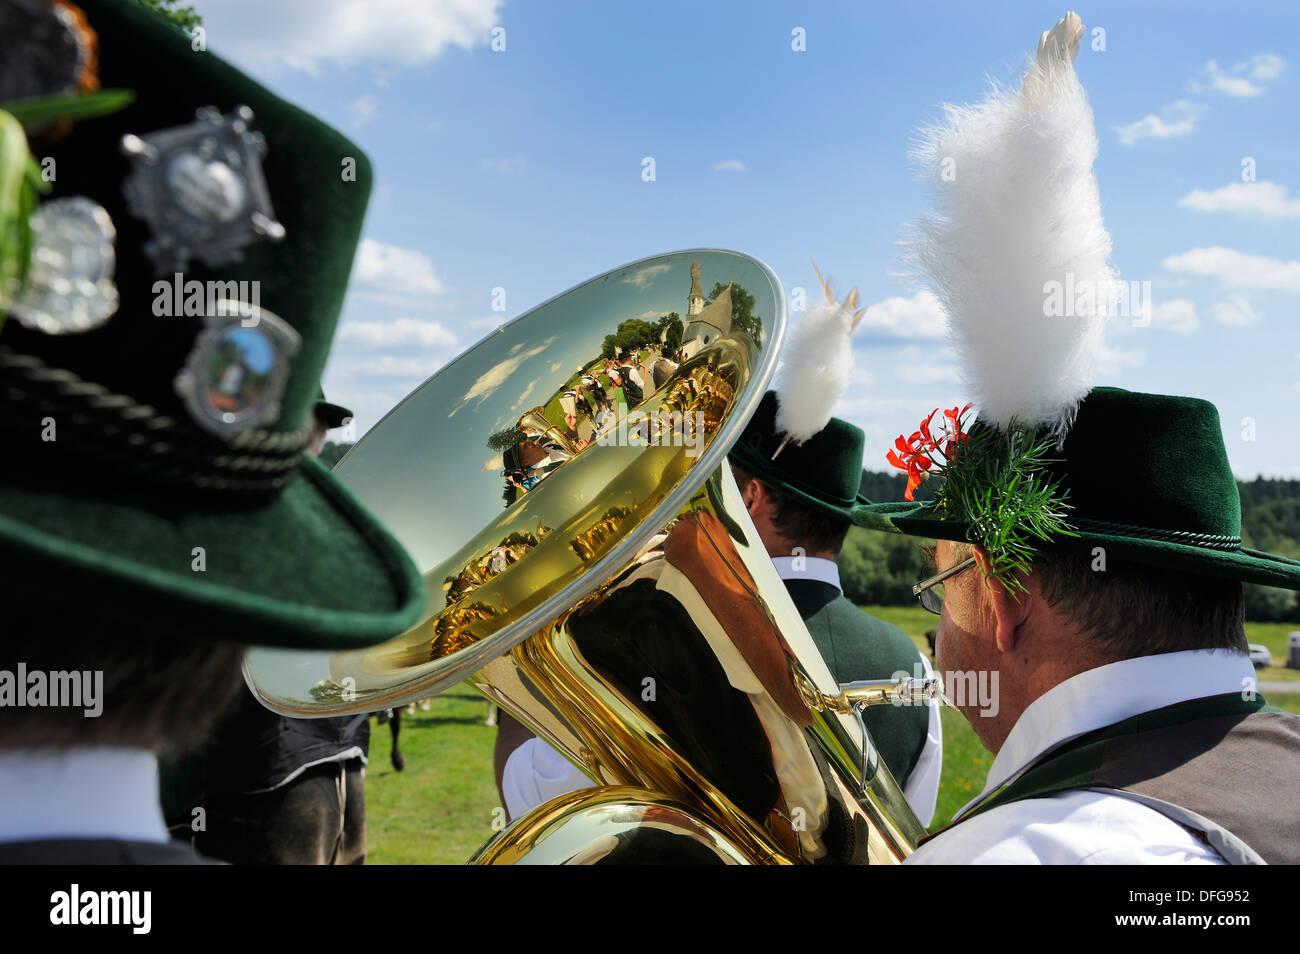 Marching Band, Leonhardiritt processione, Harmating, Egling, Alta Baviera, Baviera, Germania Foto Stock